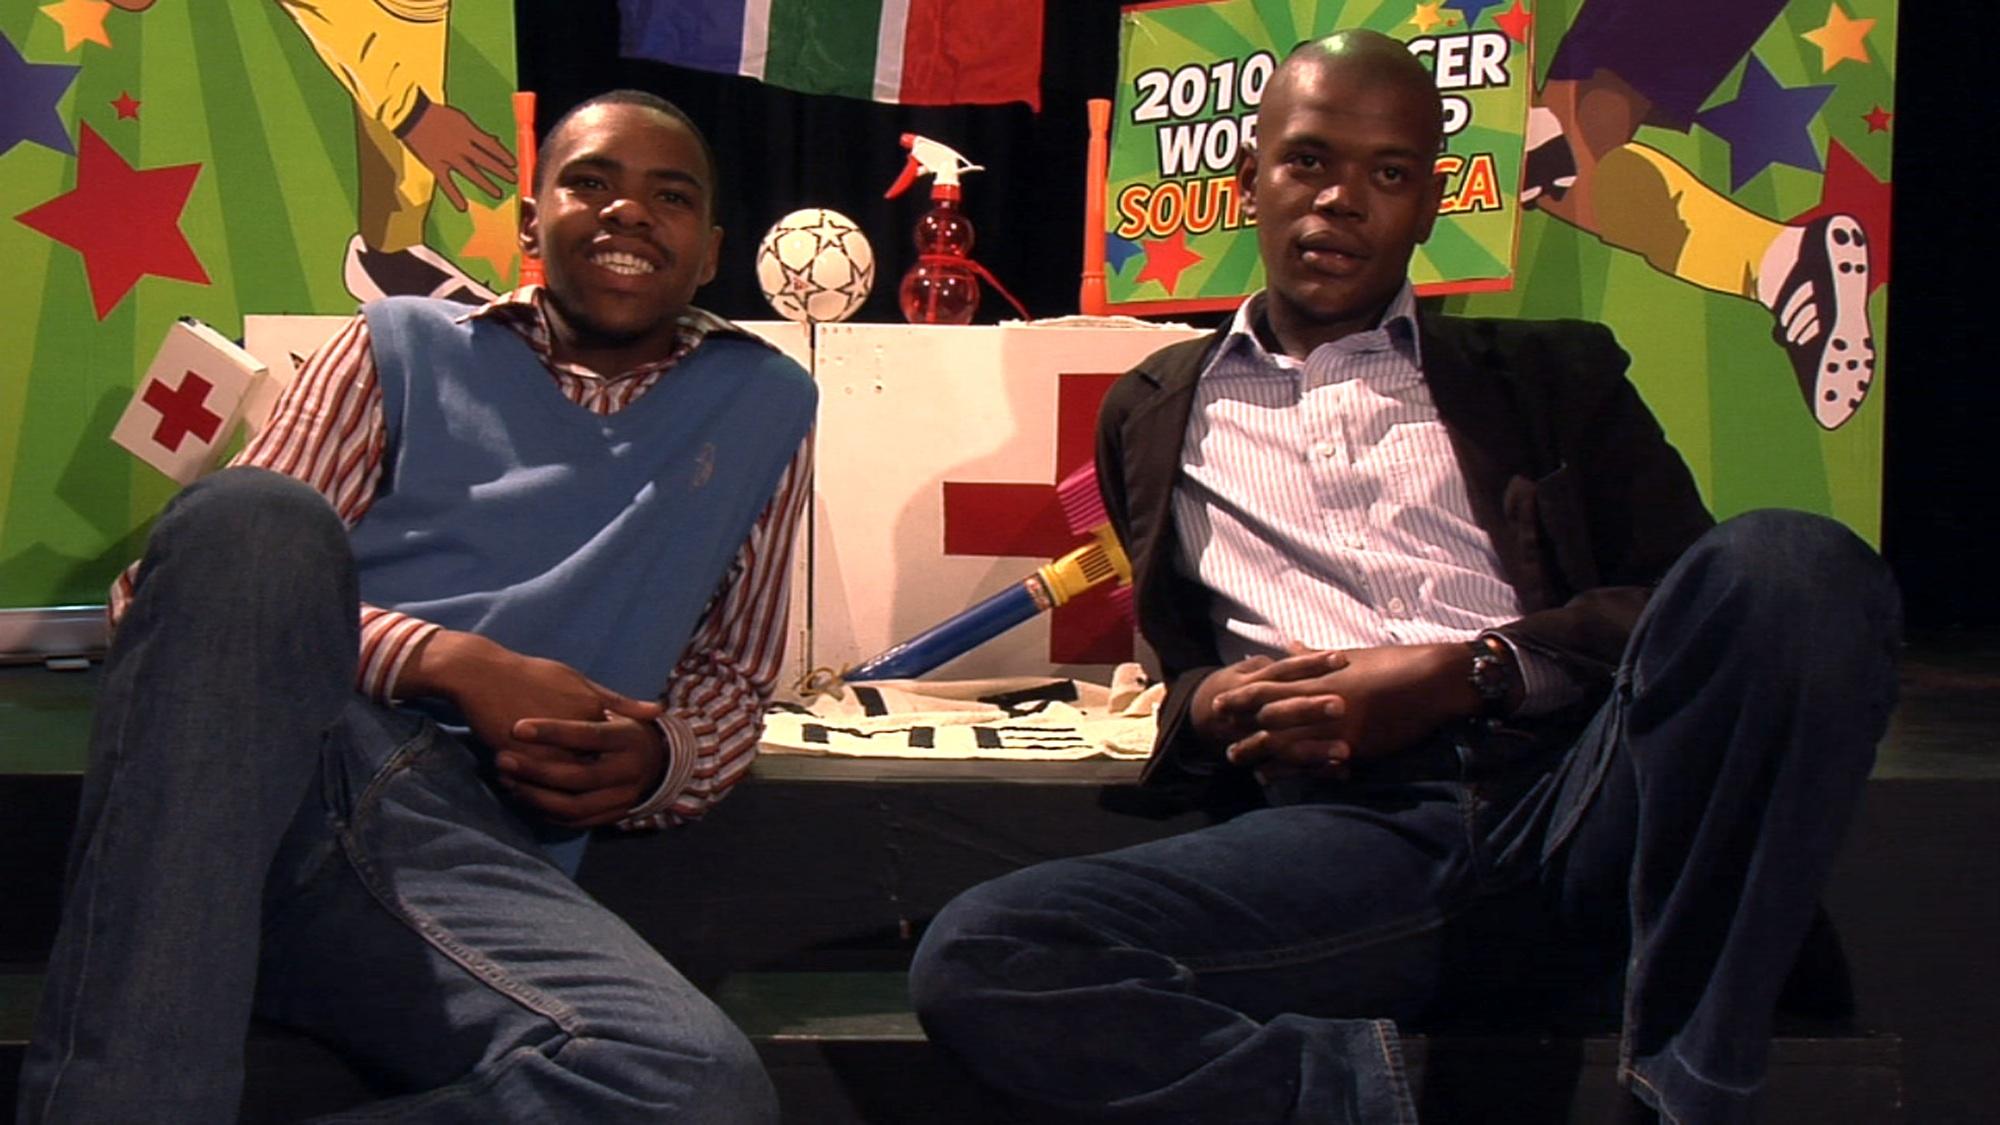 Siphiwe Fangase & Nkumbuzo Nkonyana